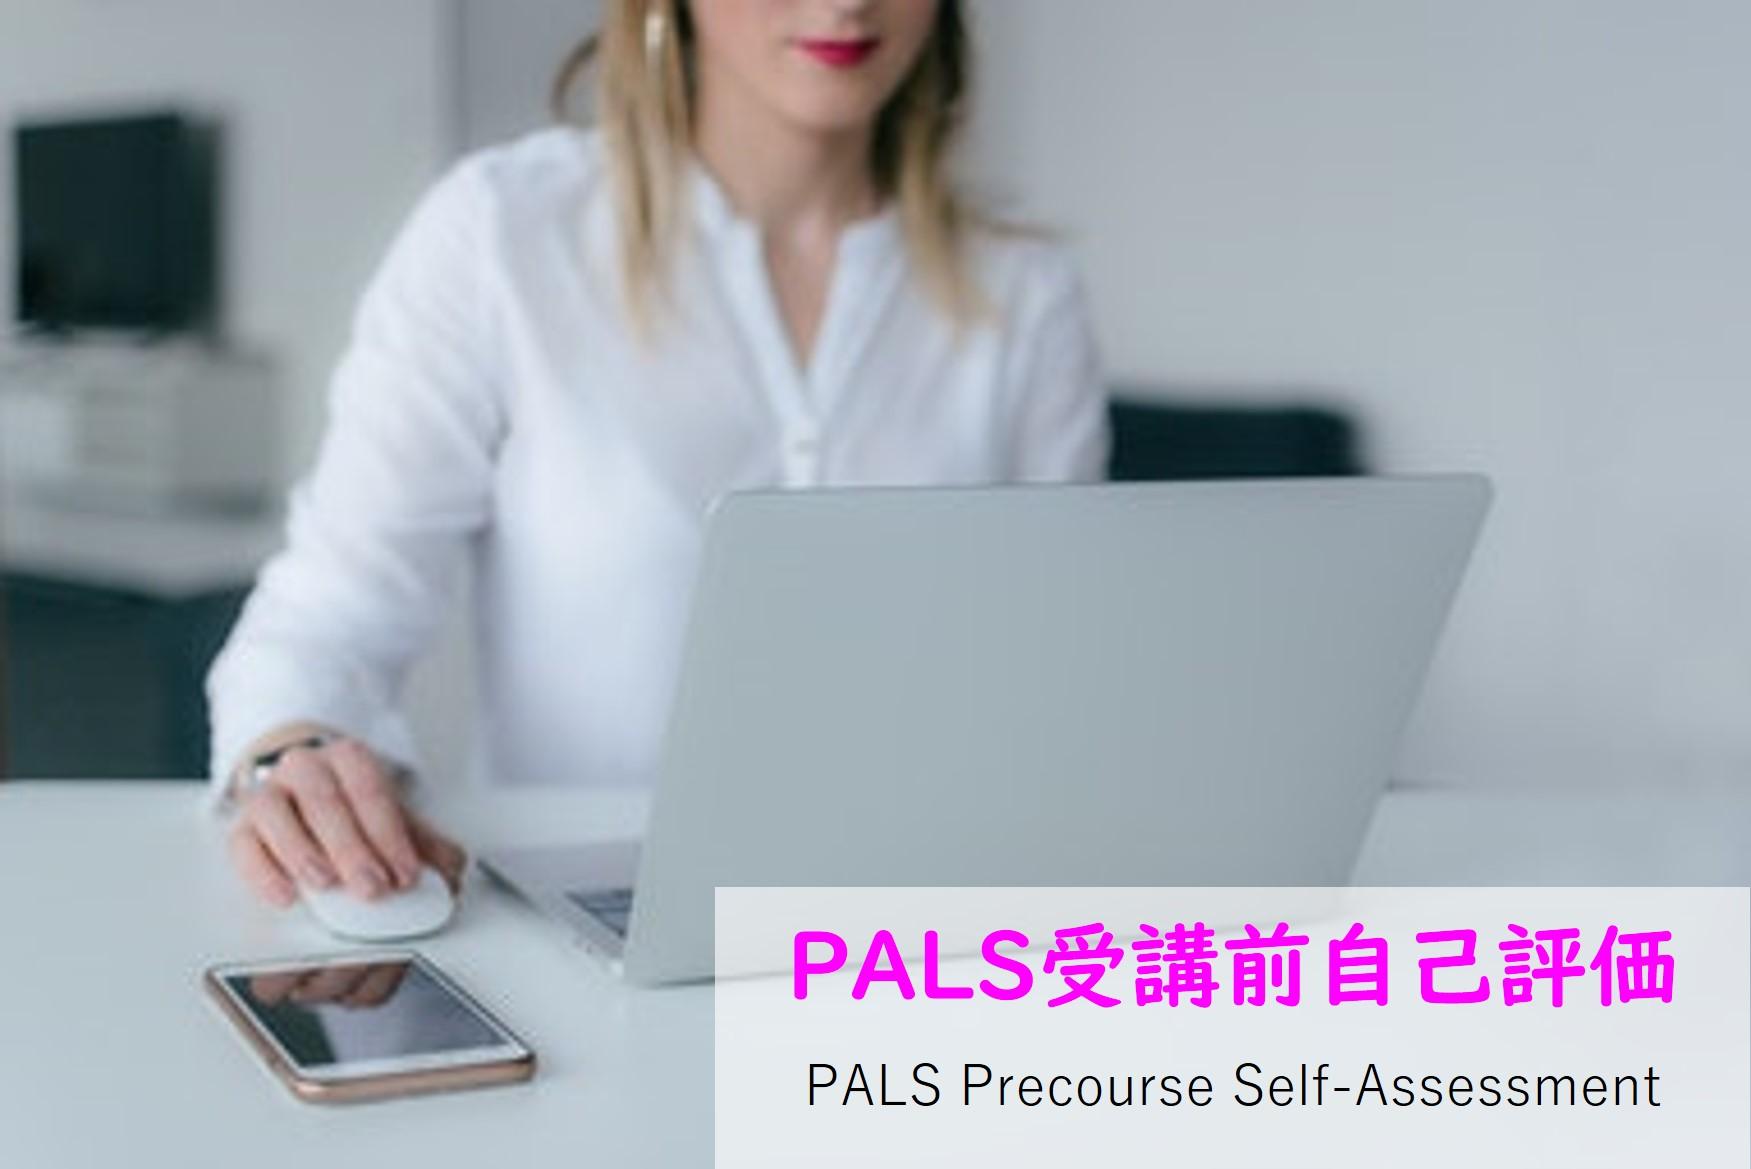 【PALS】G2020版 受講前自己評価の方法